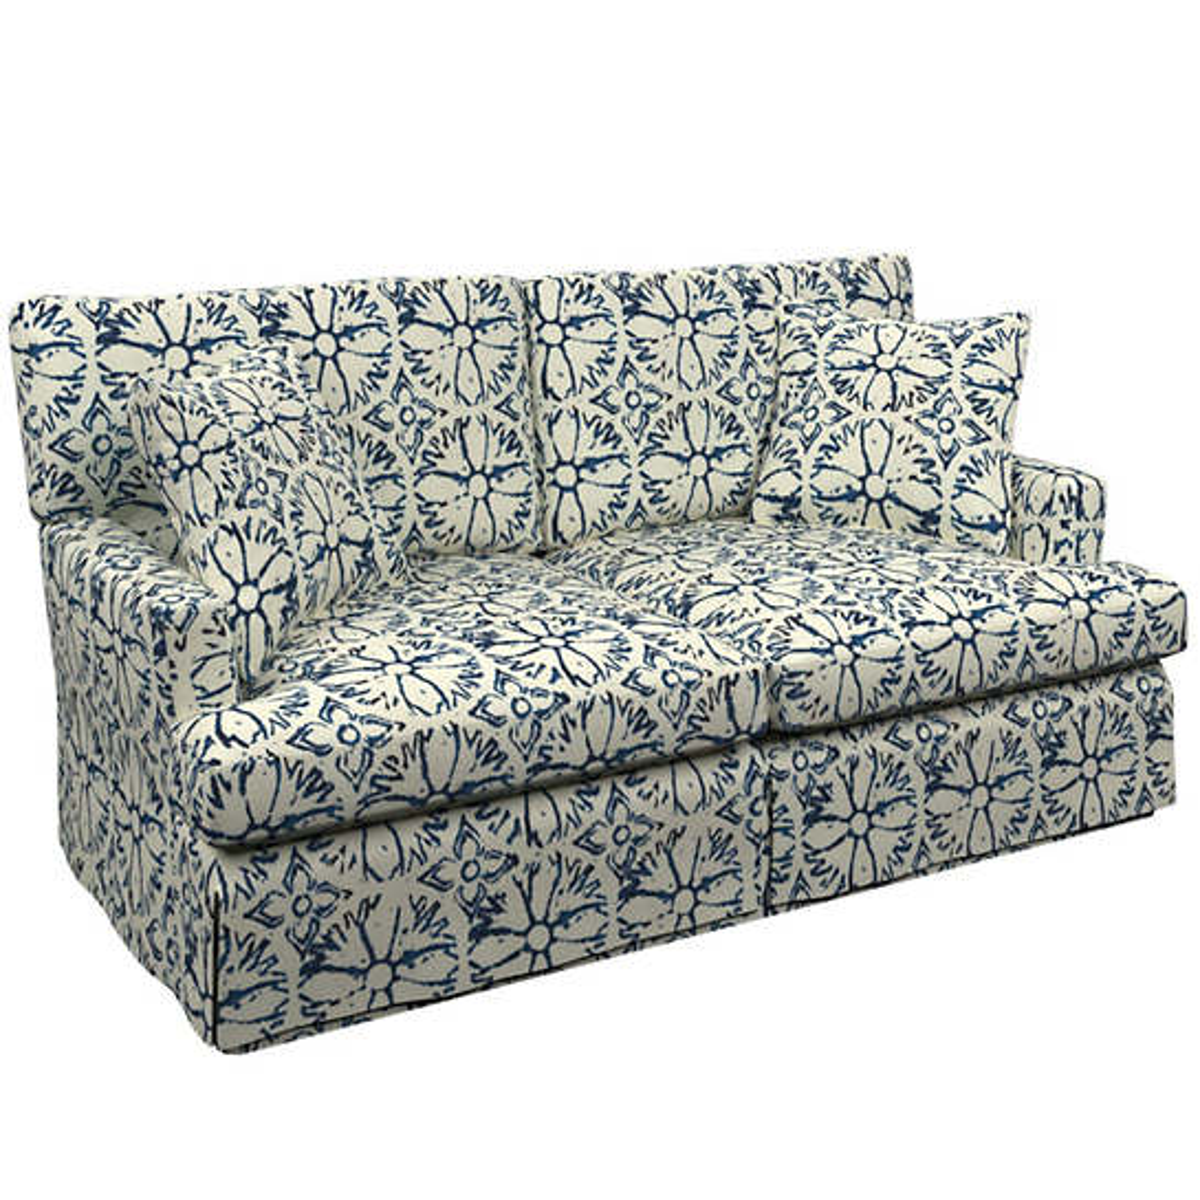 Aylin Linen Saybrook 2 Seater Slipcovered Sofa